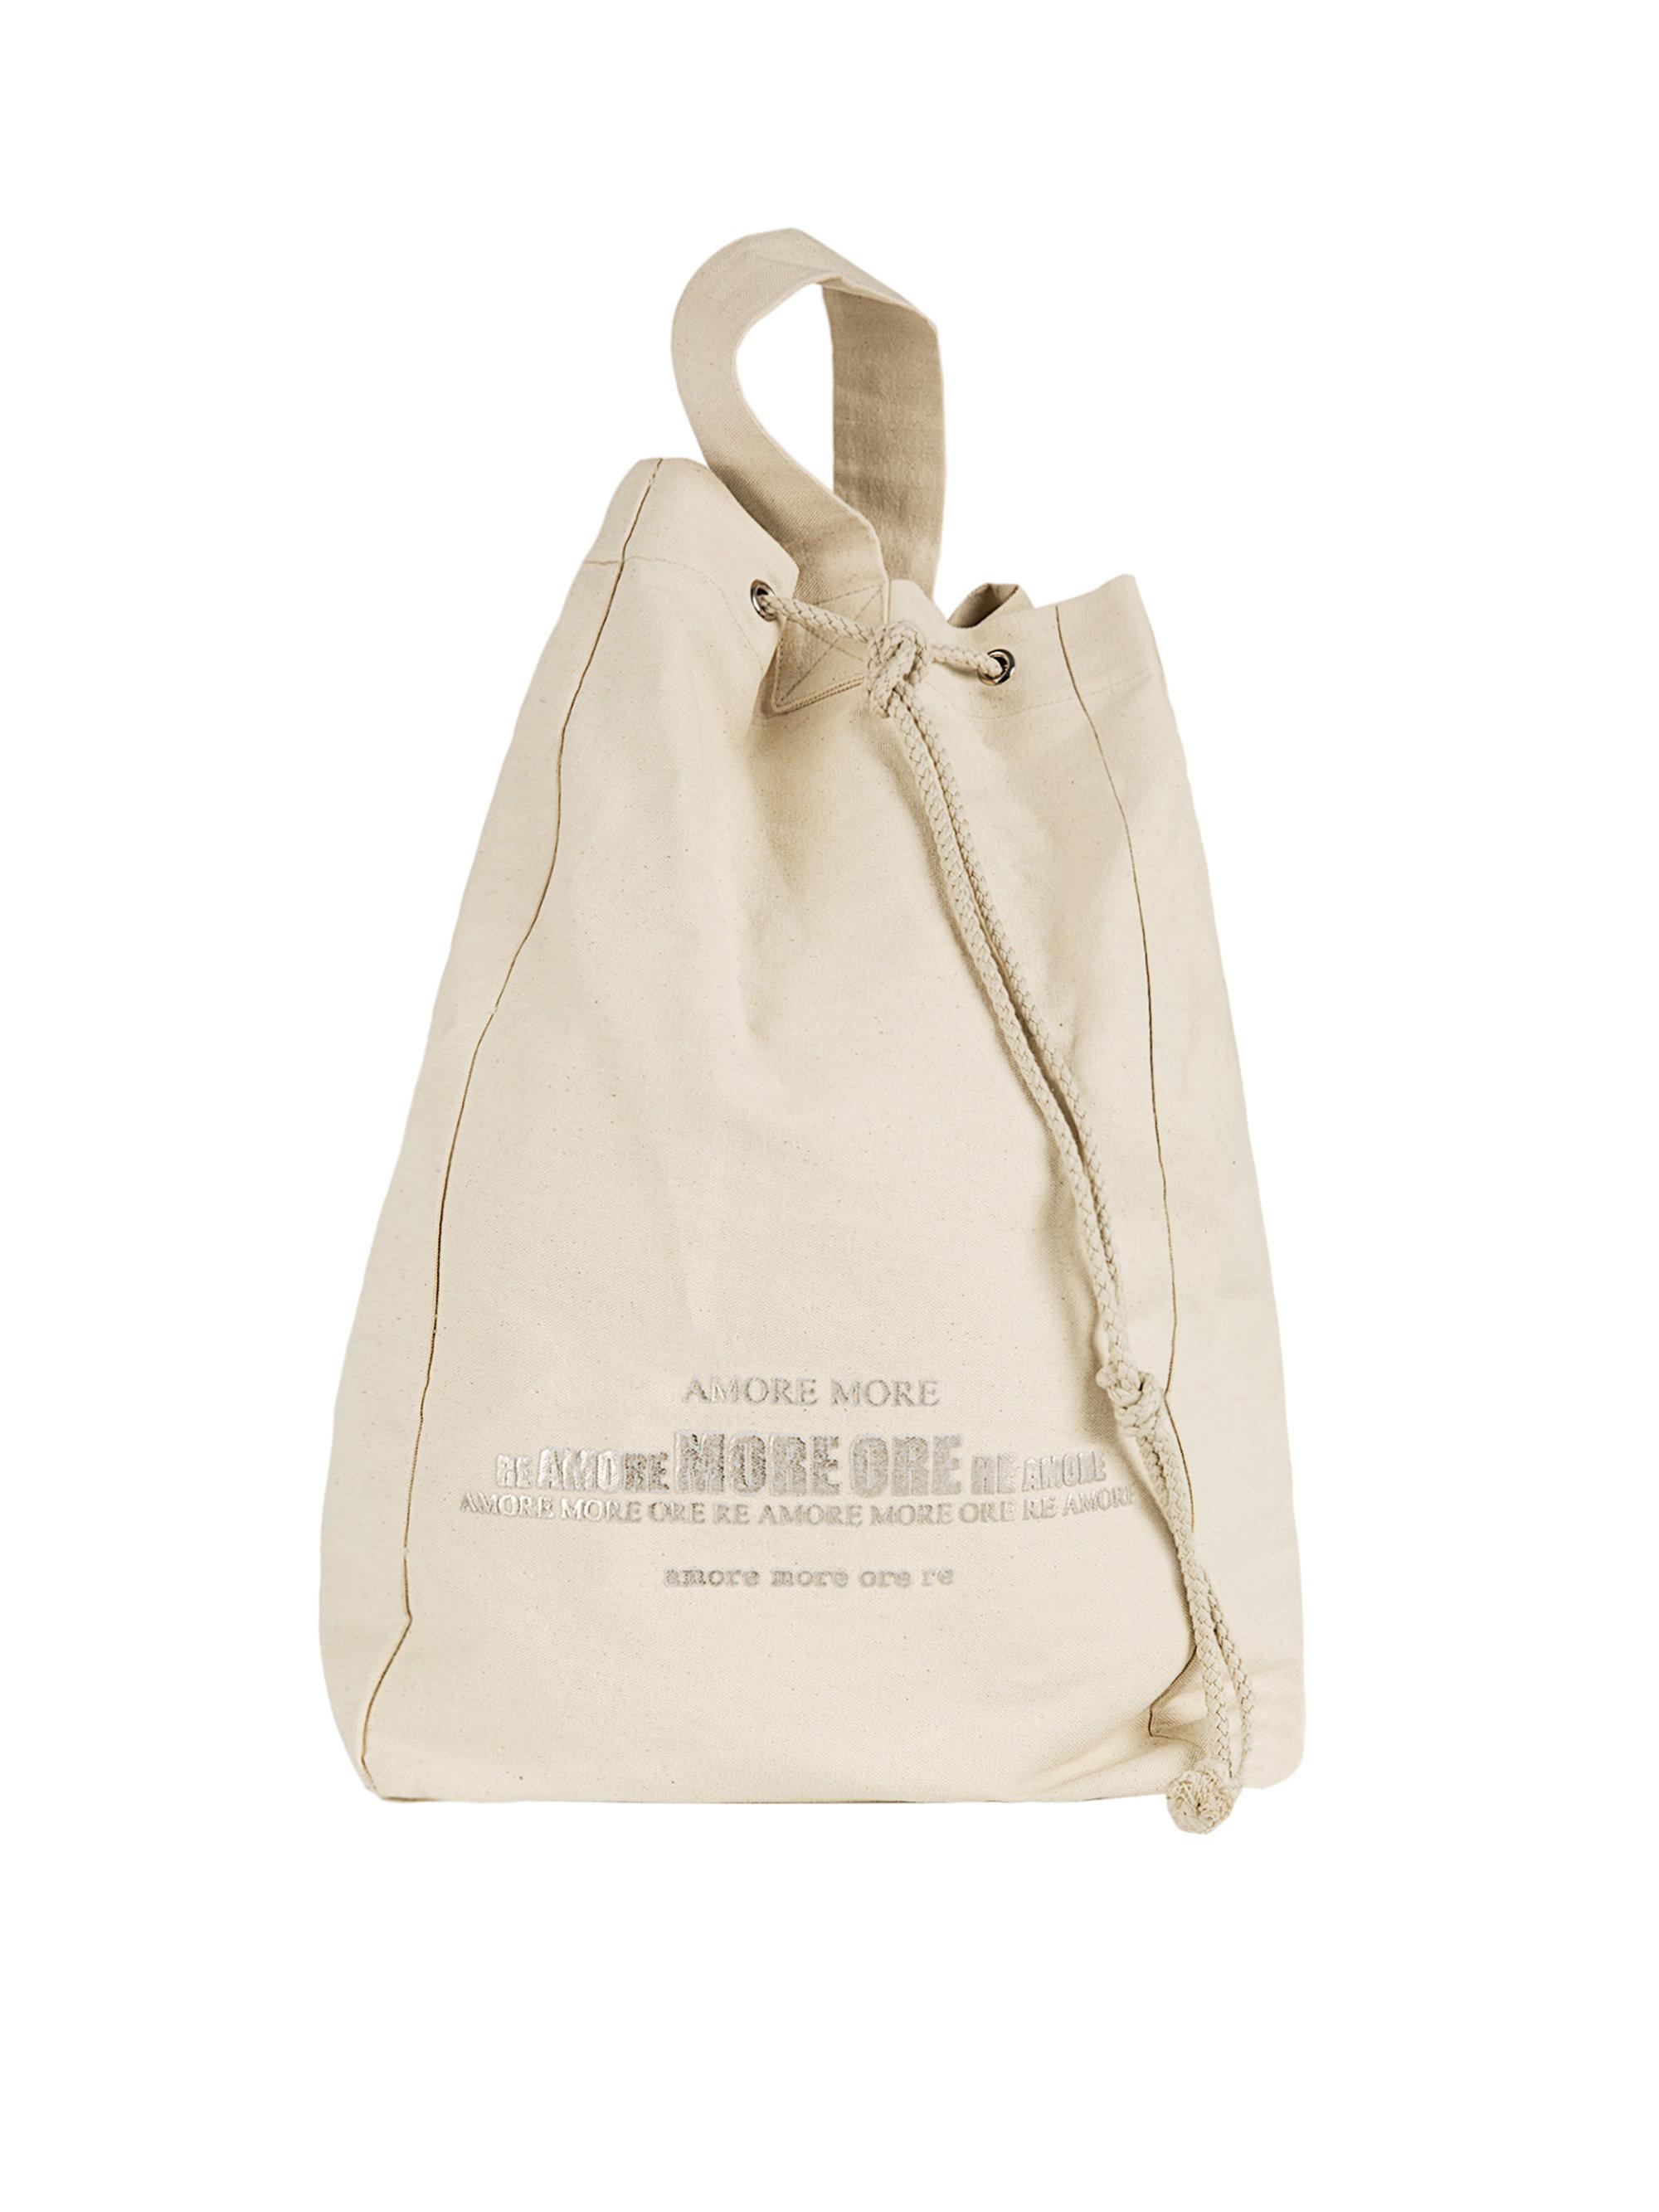 Brunello cucinelli Cotton Beach Bag in Natural | Lyst